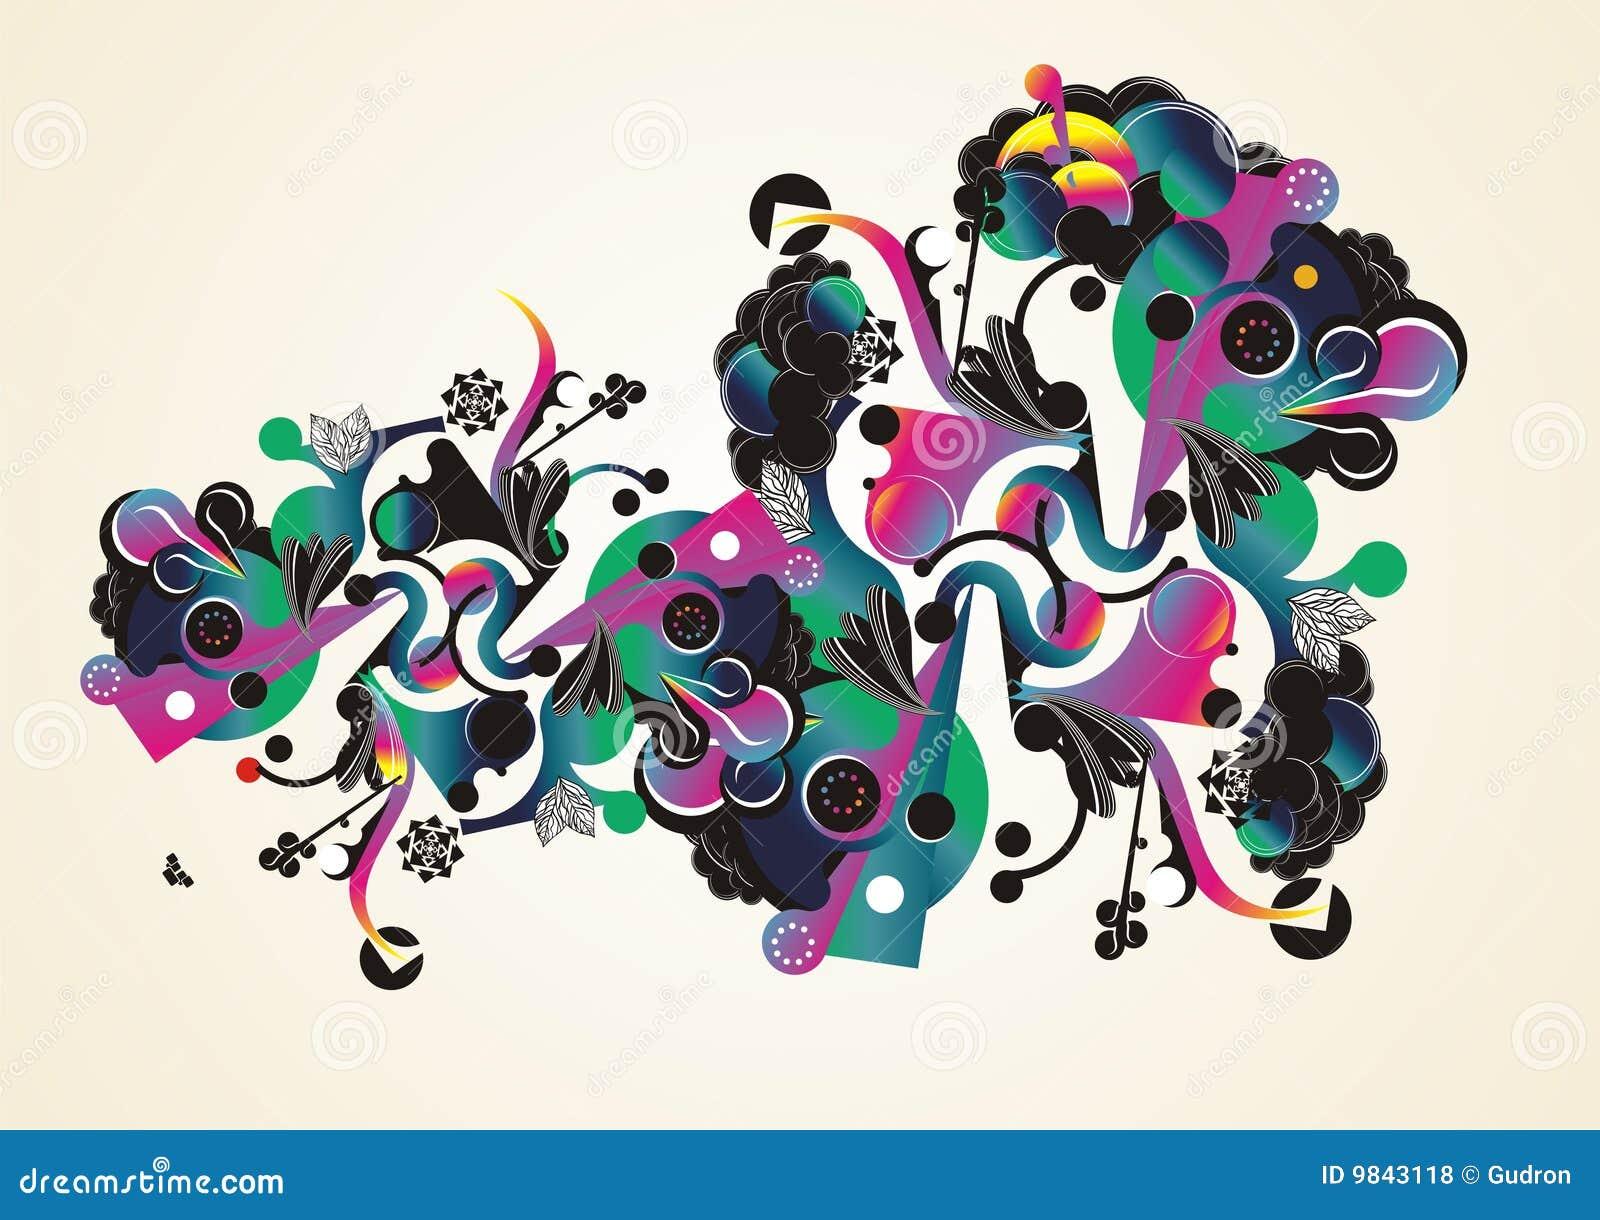 Colorful Abstract Orga...